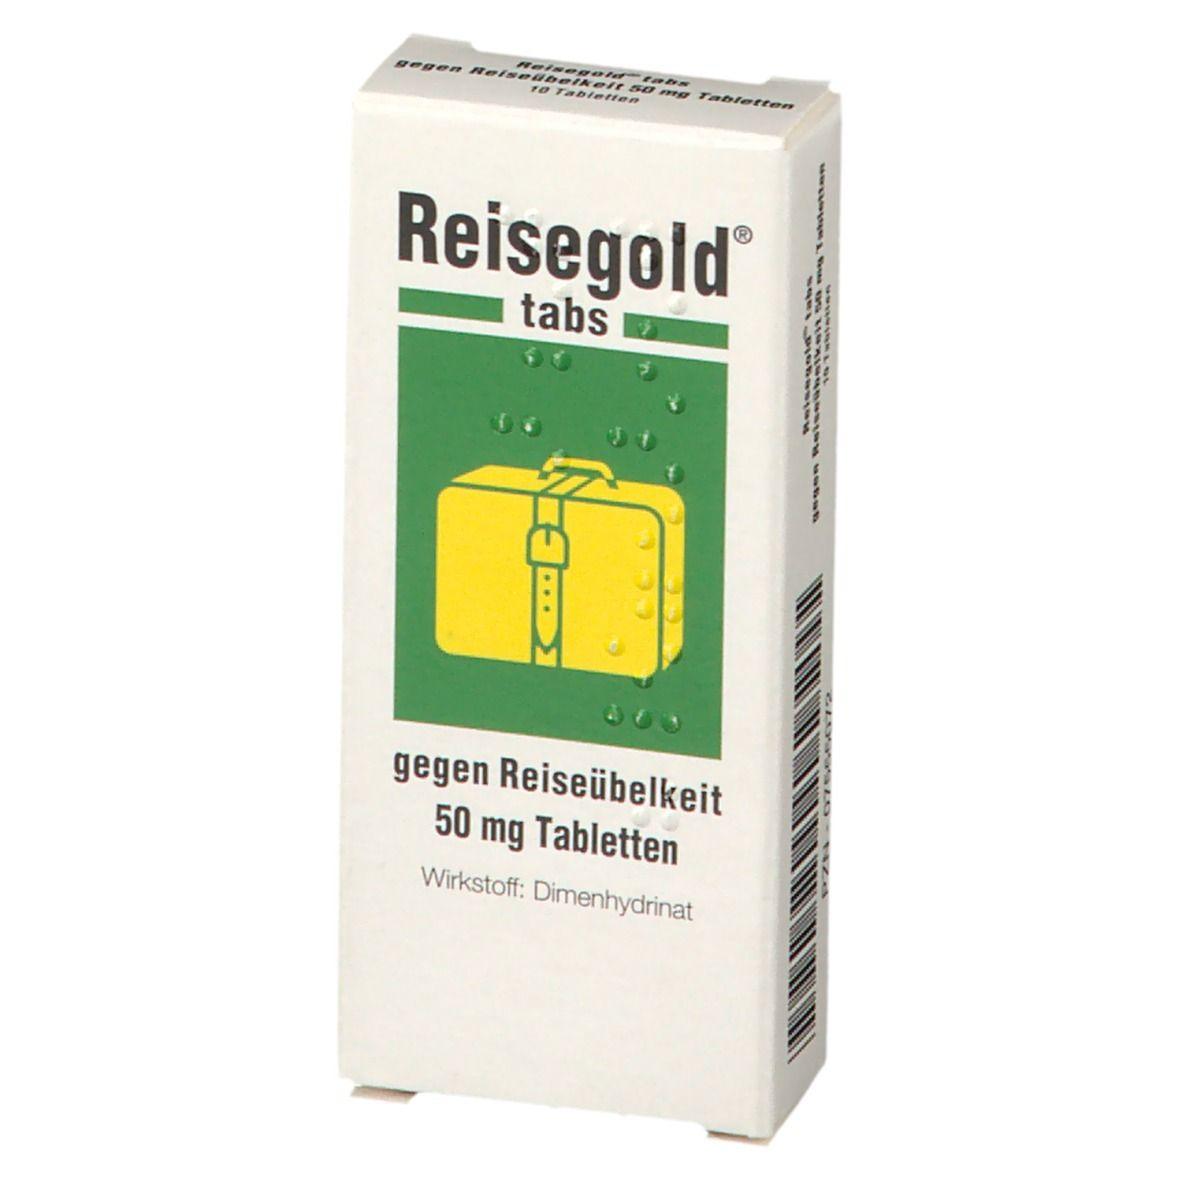 Reisegold® Tabs